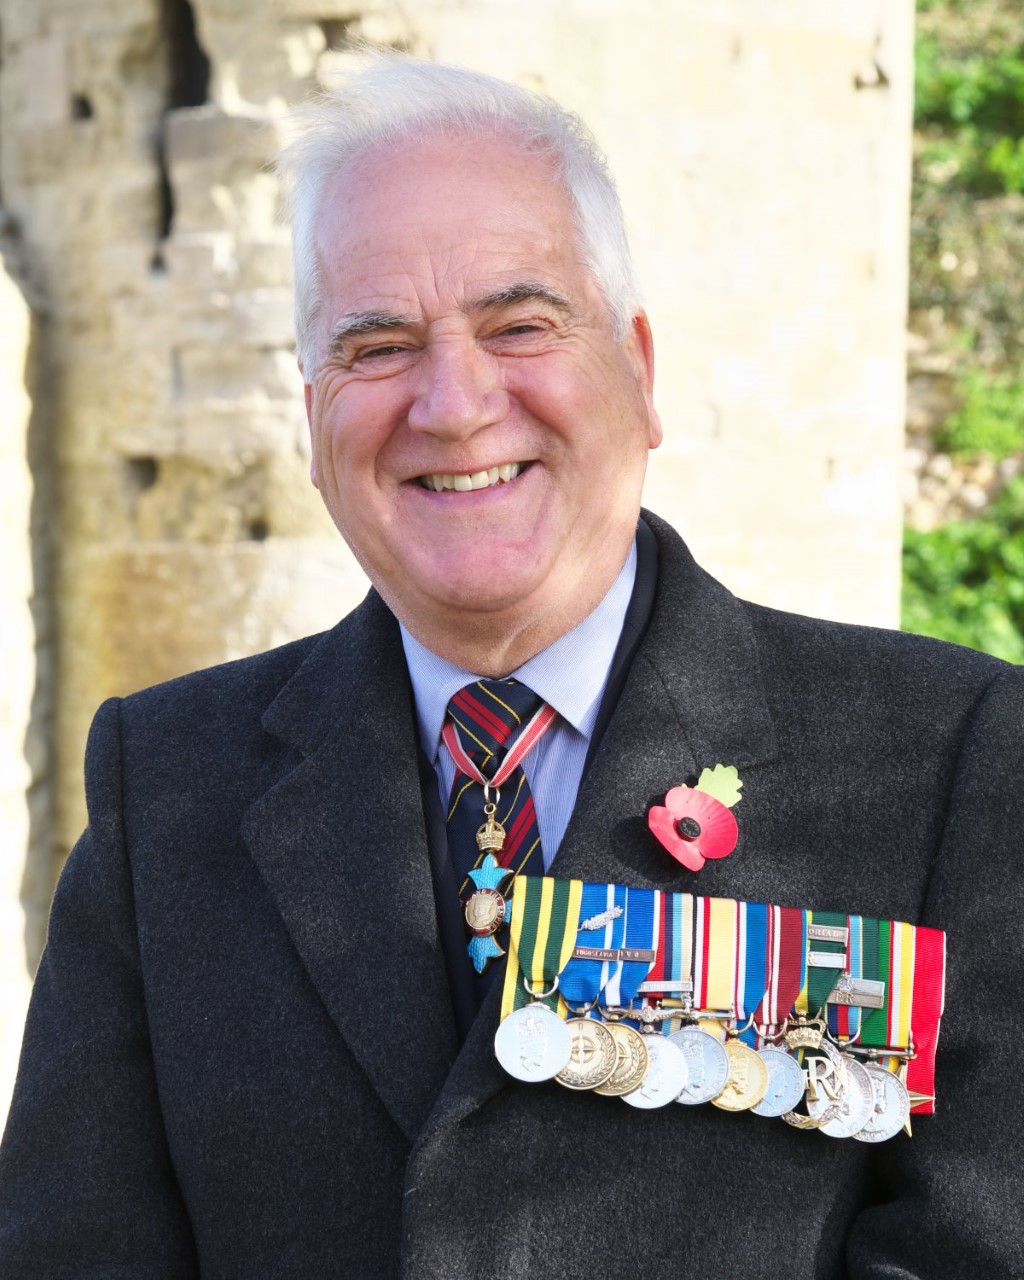 Brigadier Maurice Sheen CBE QVRM TD DL